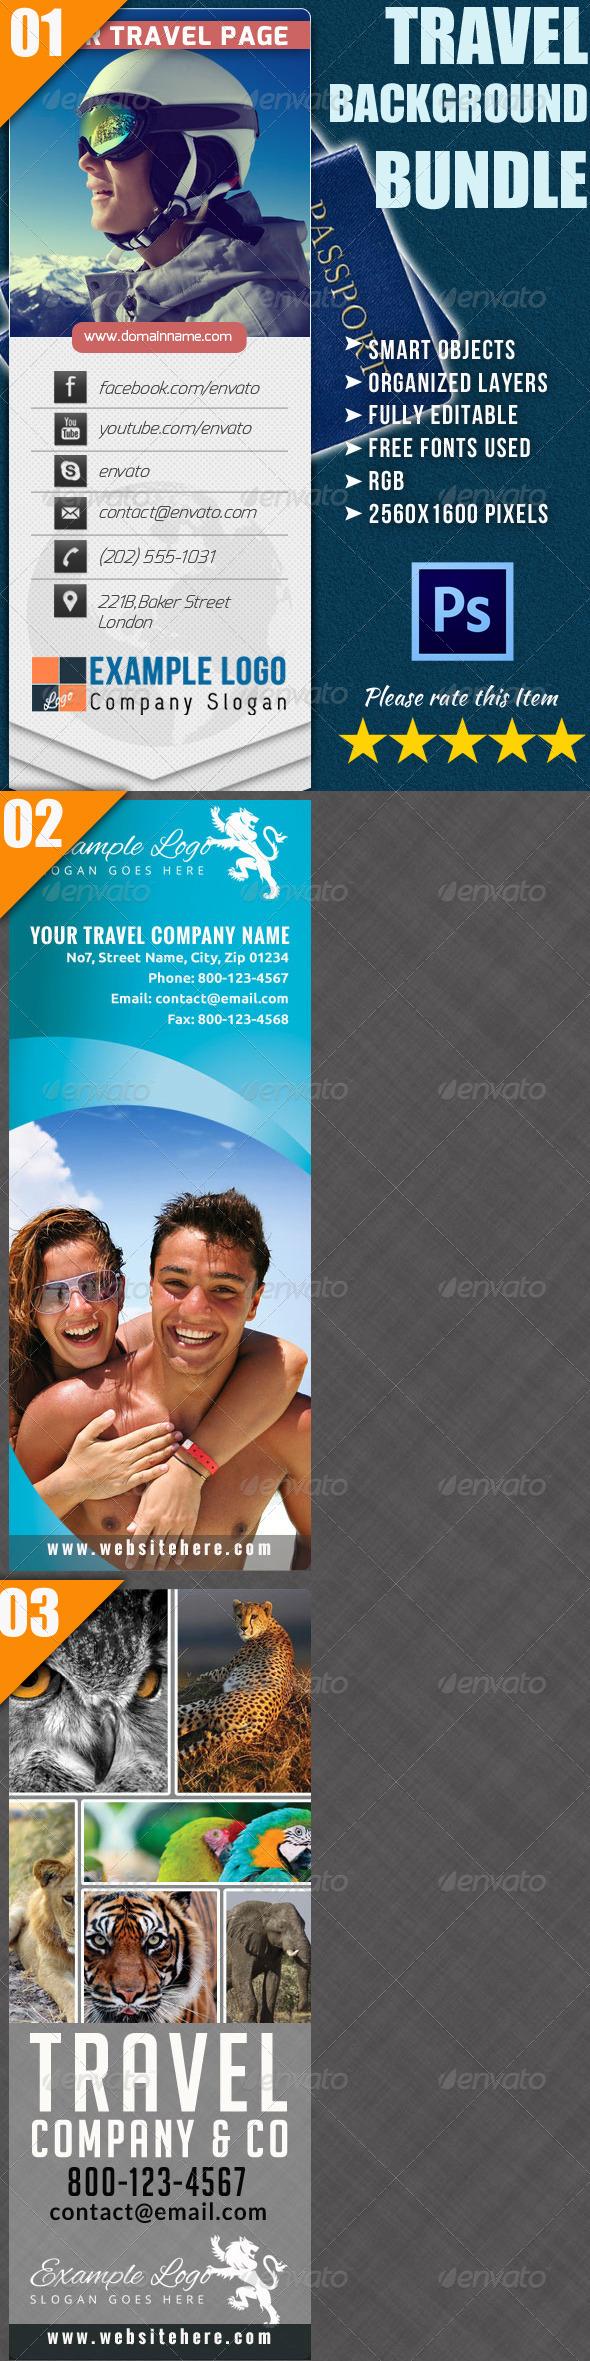 Travel Twitter Background Bundle